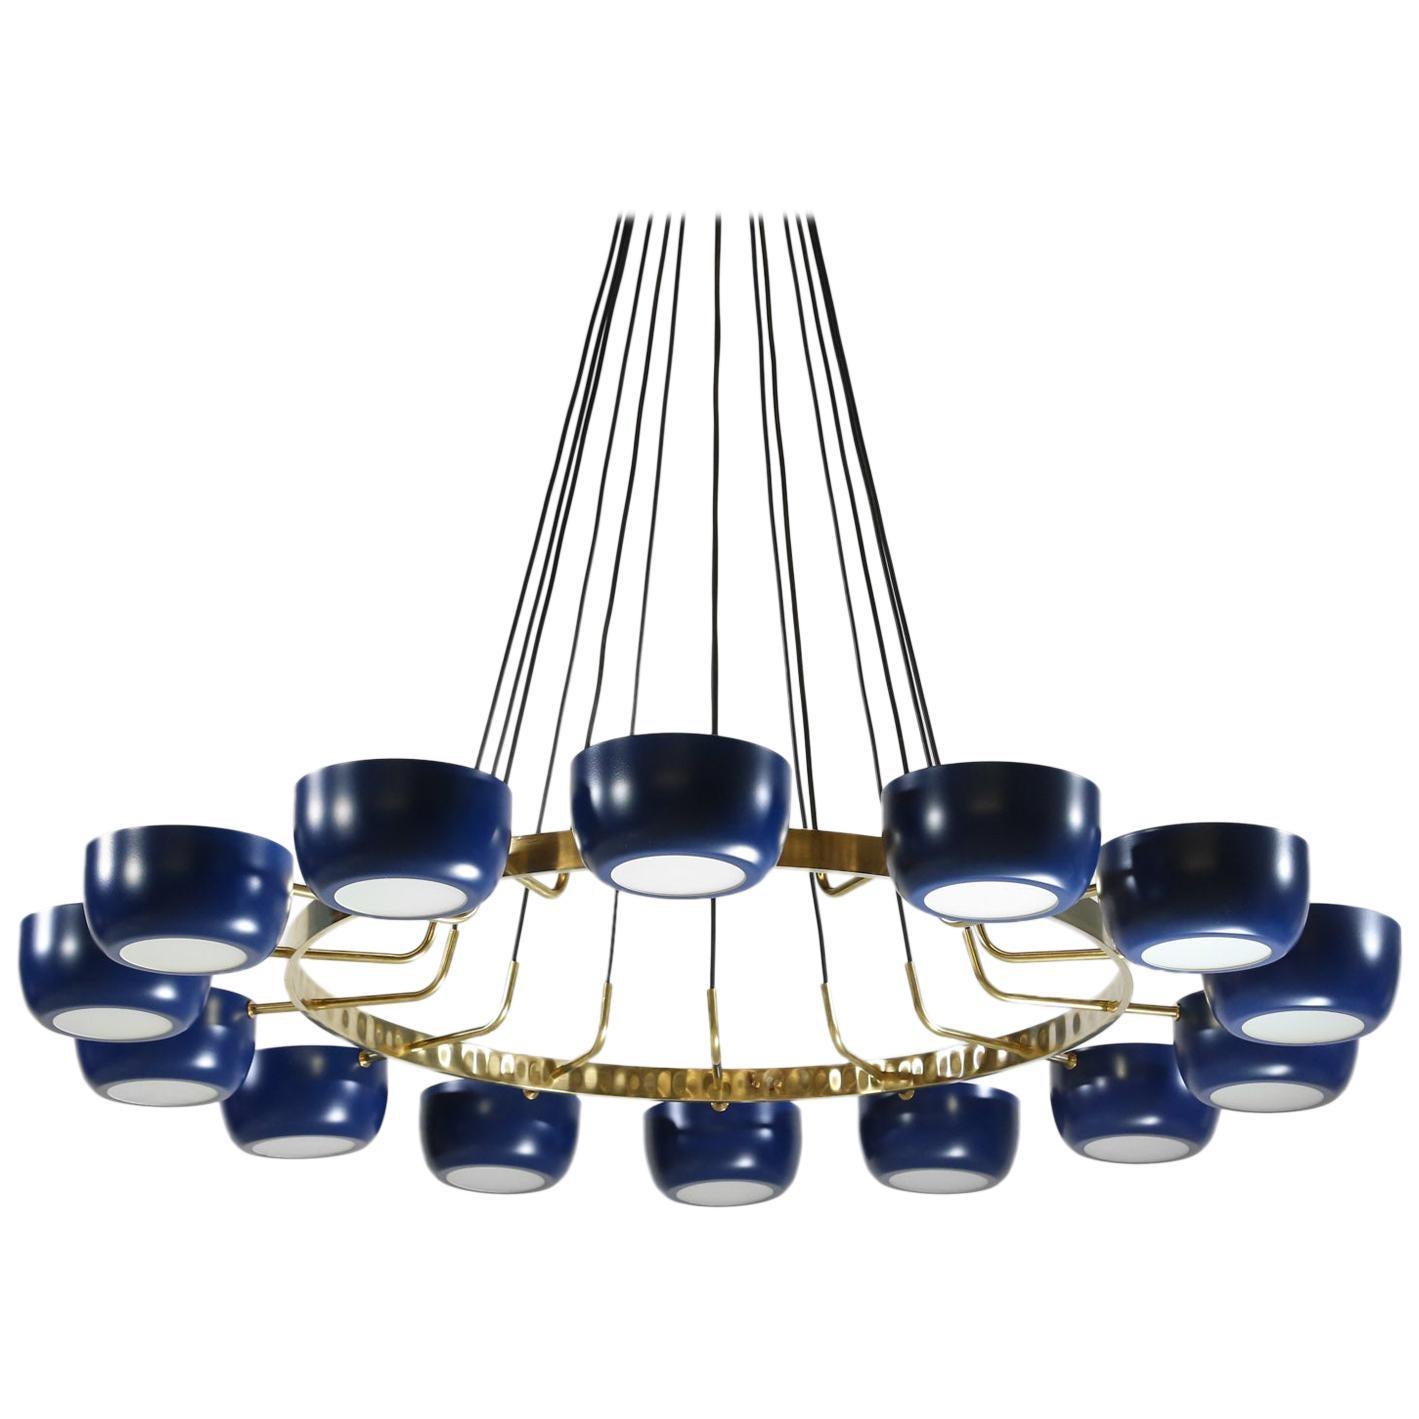 "Large Italian Modern Blue Chandelier with 14 Lights in Stilnovo Style ""Moderna"""